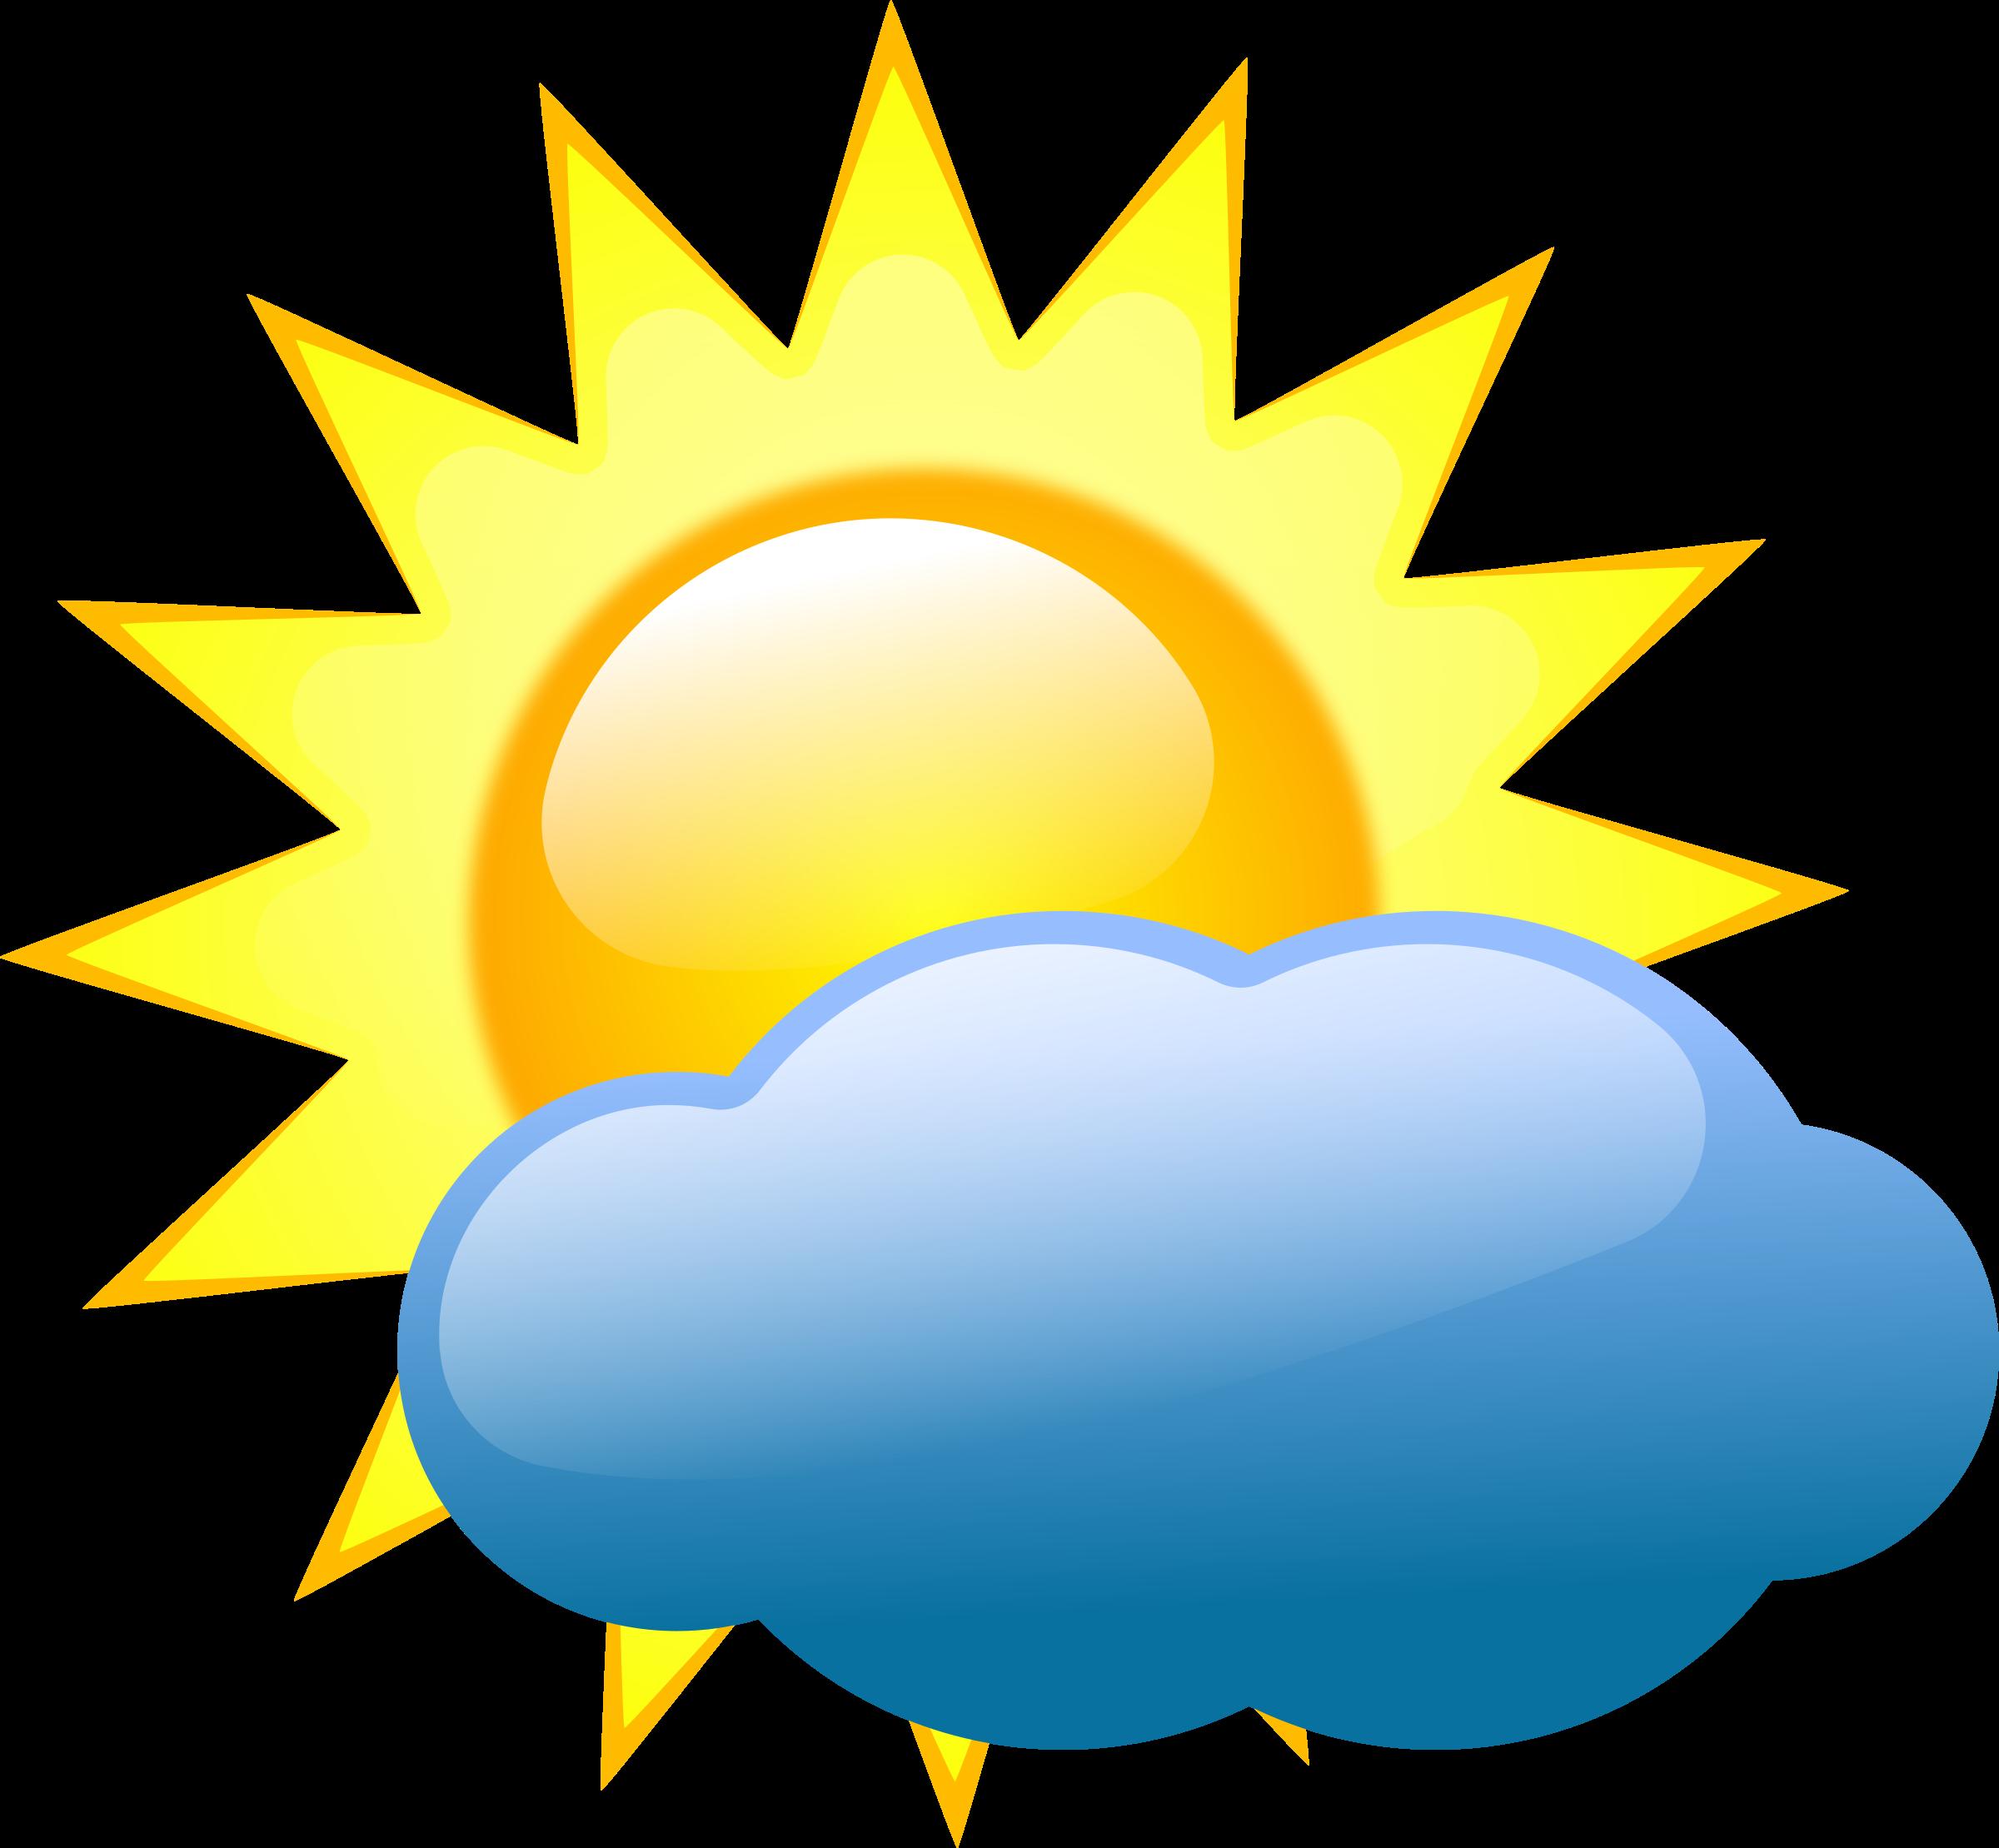 vector transparent library Weather clipart. Symbols big image png.